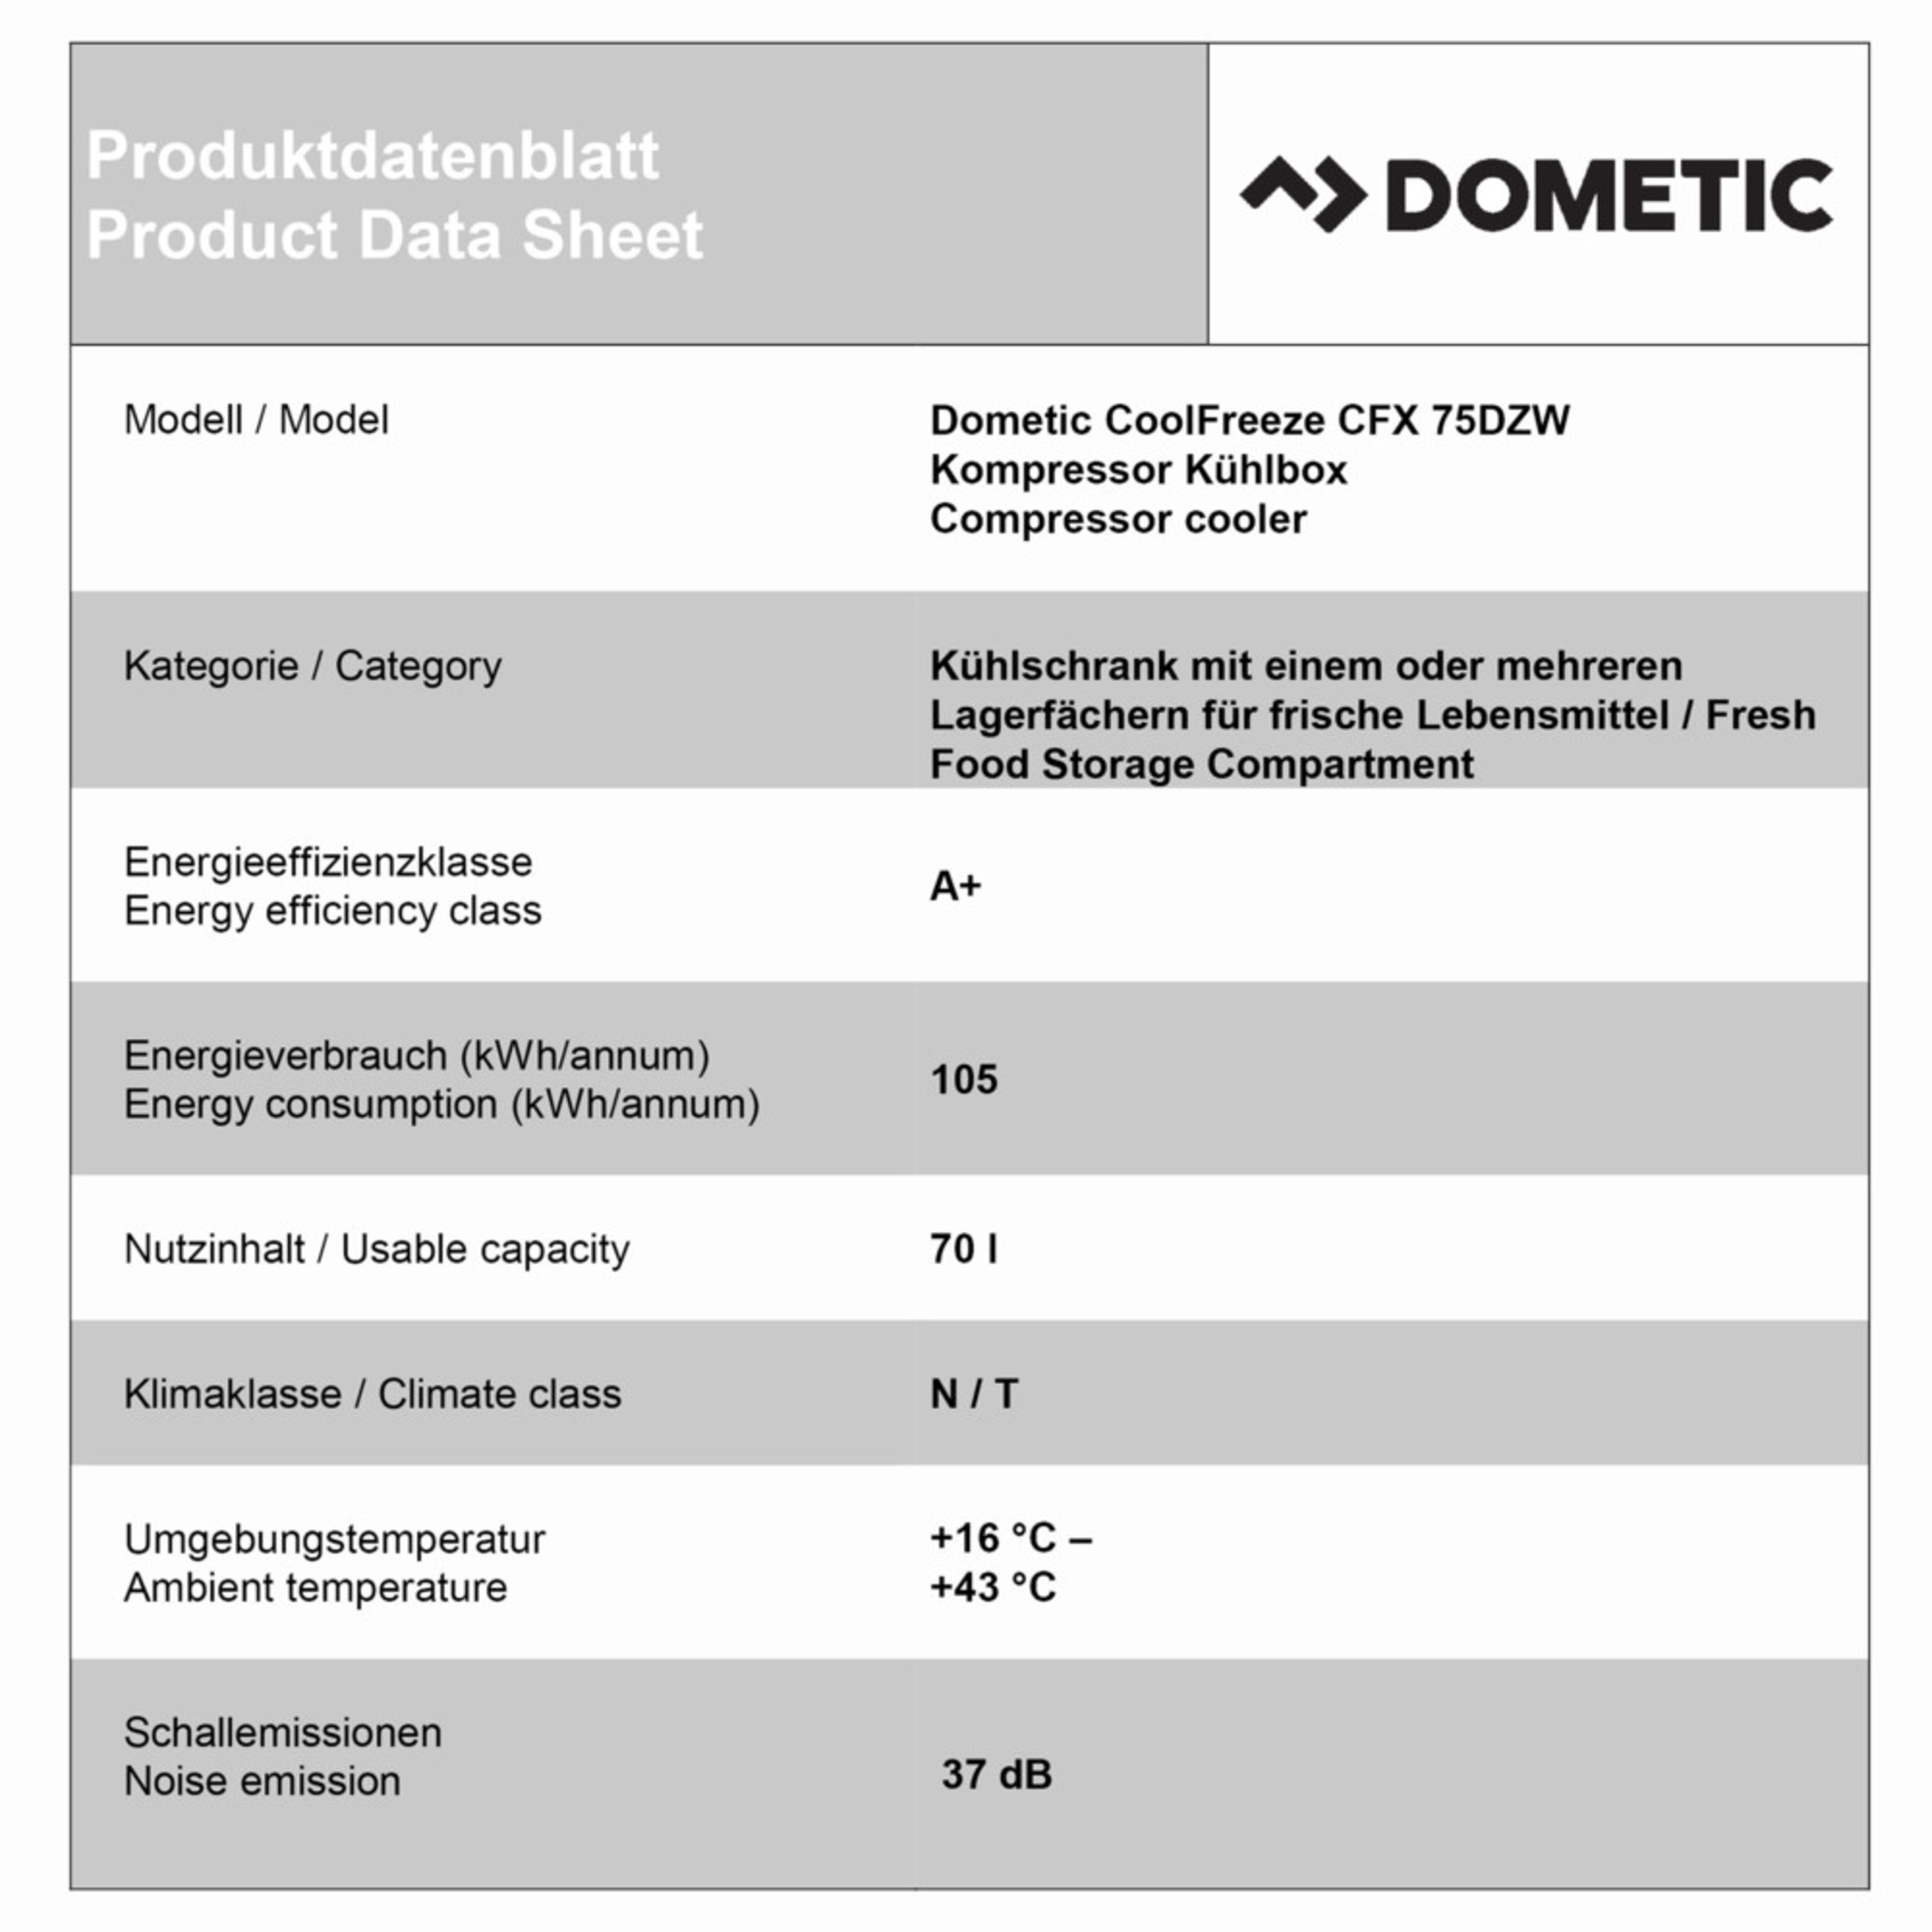 Dometic CoolFreeze CFX 75DZW Productkaart